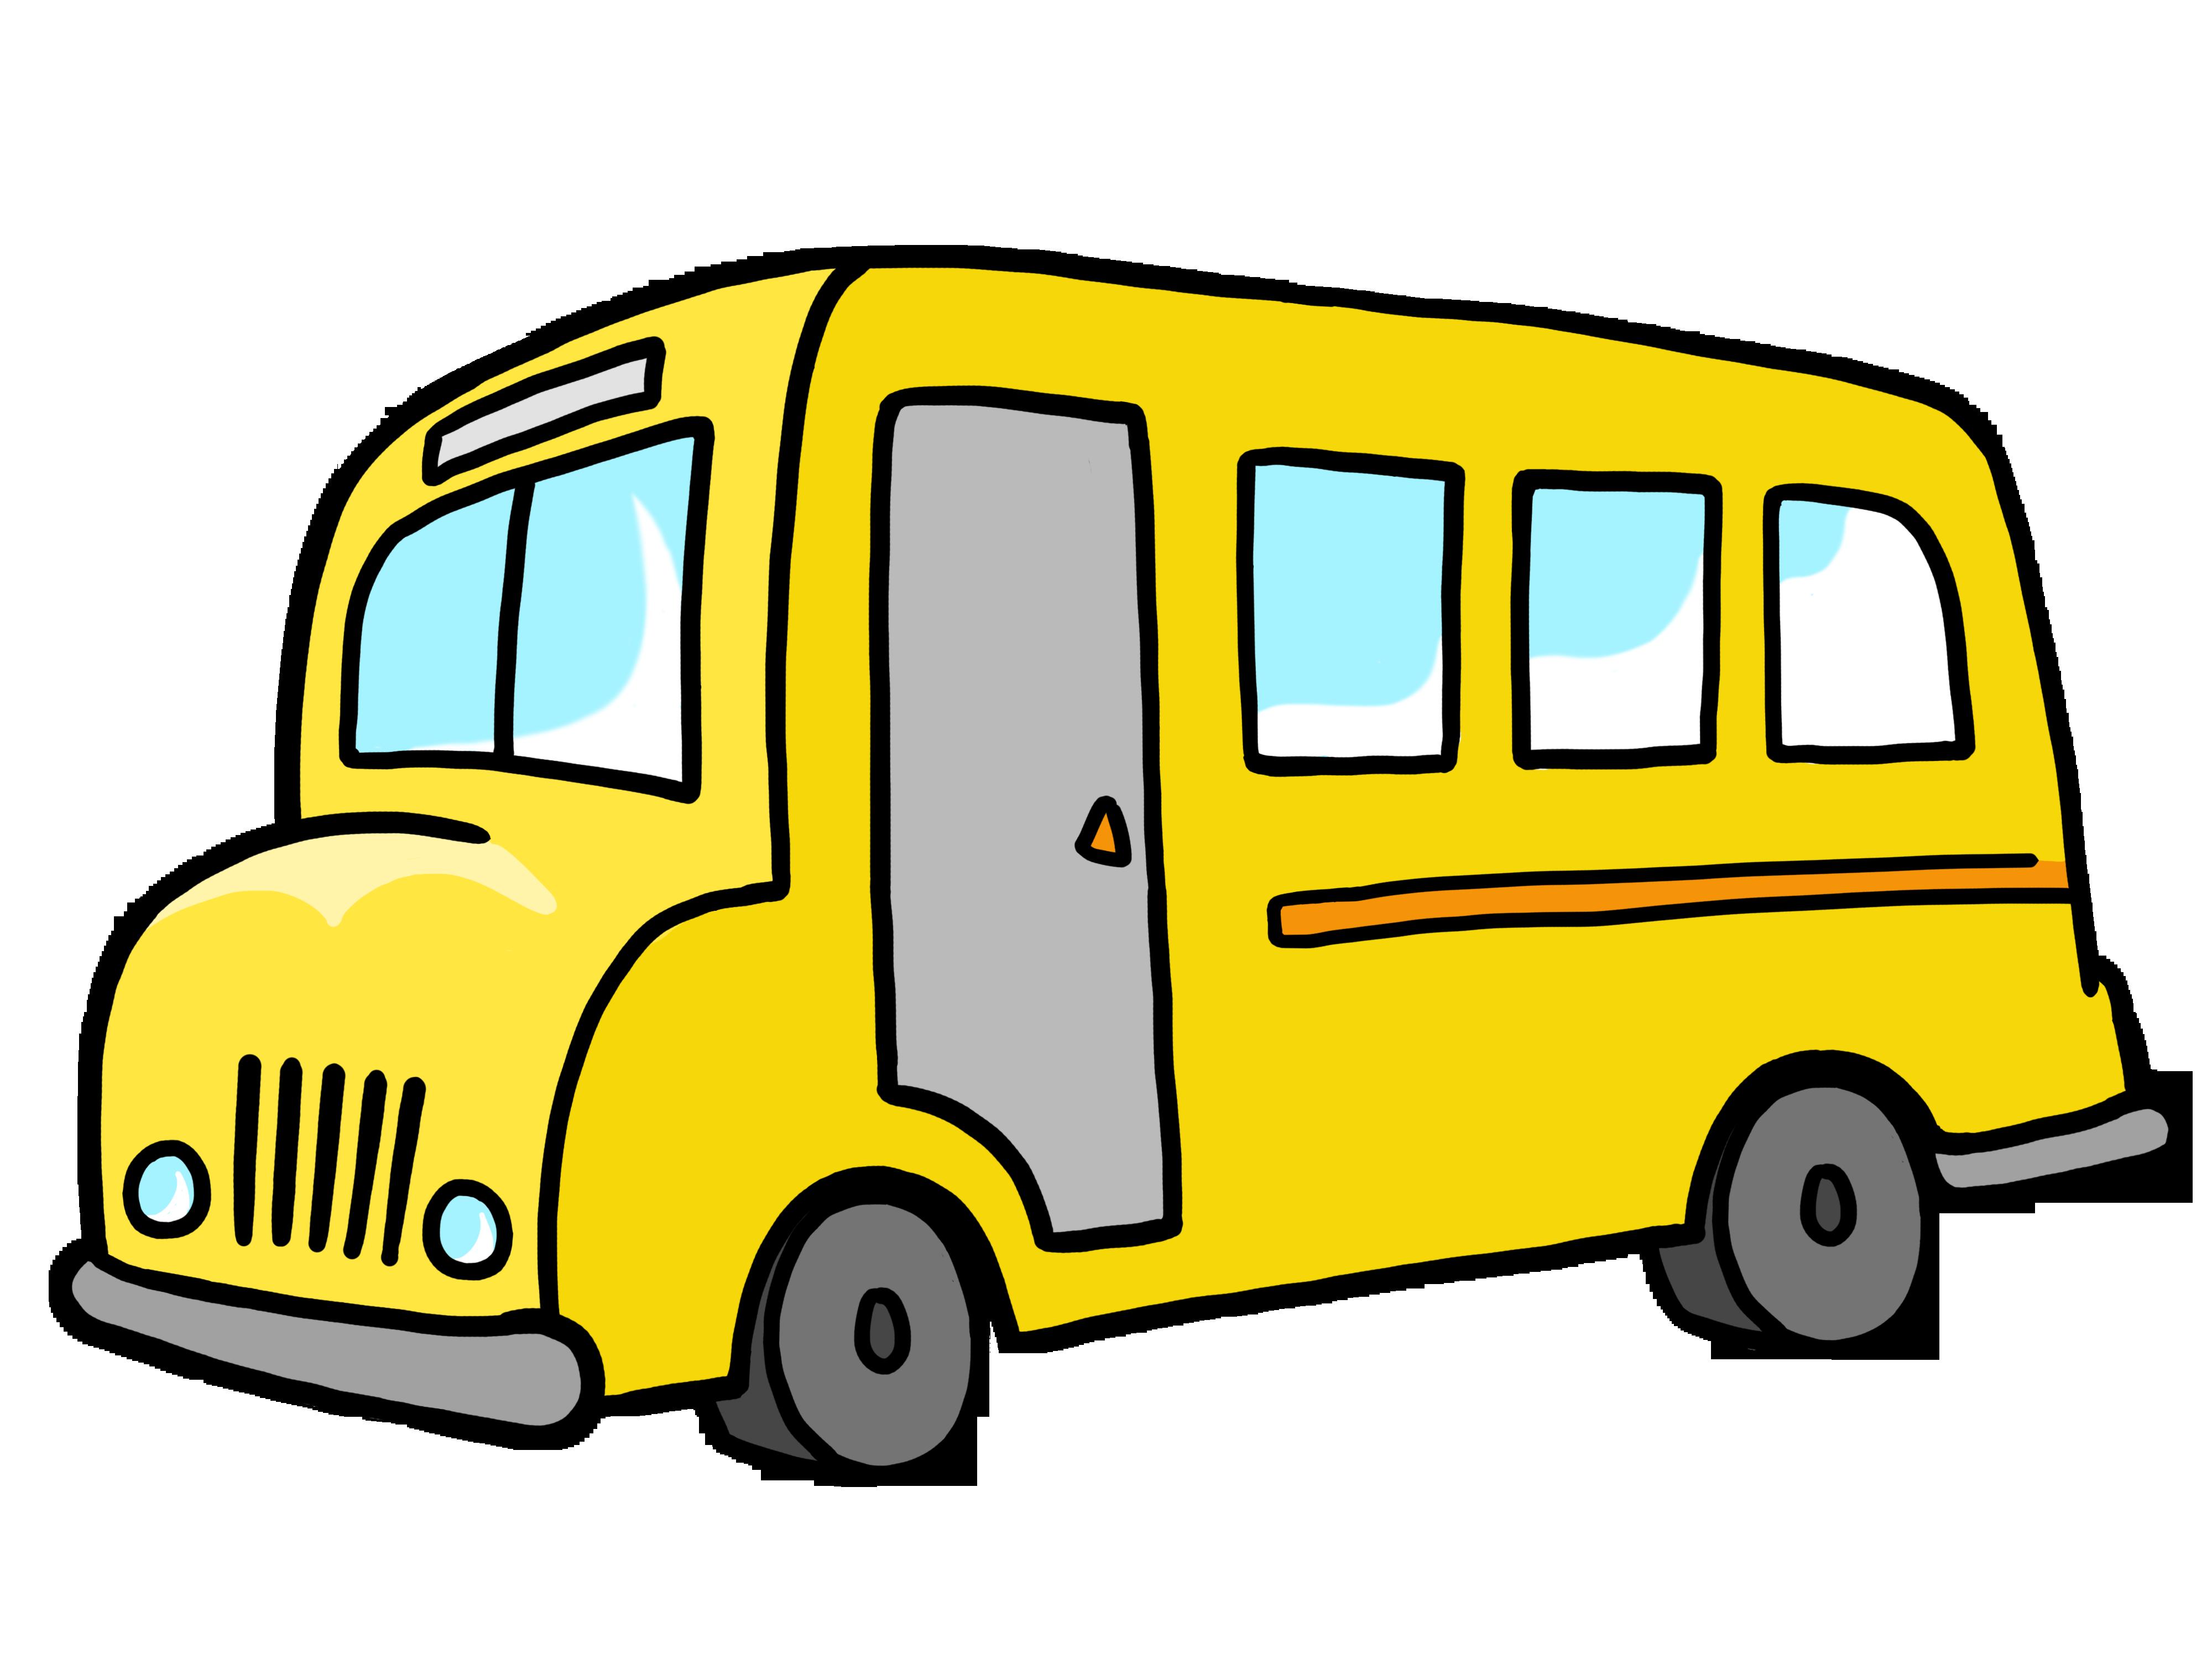 Cute school bus clip art free clipart images 5